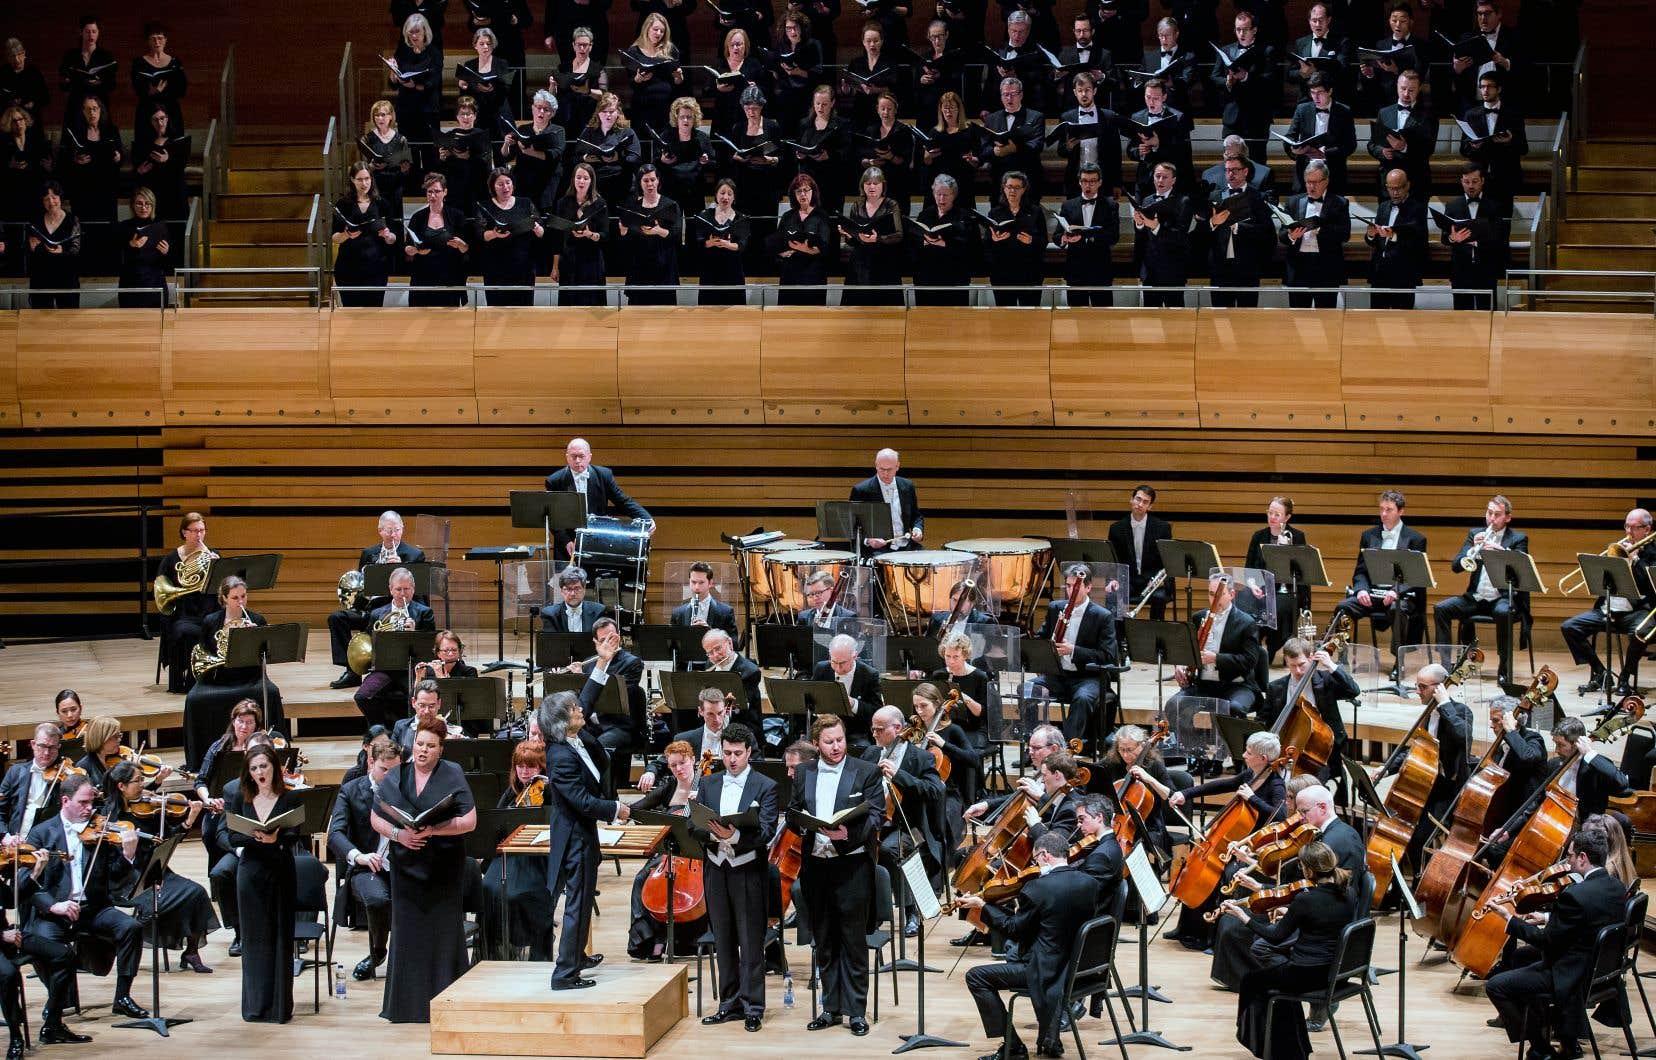 Le chef d'orchestre Kent Nagano dirige l'orchestre depuis 2006.